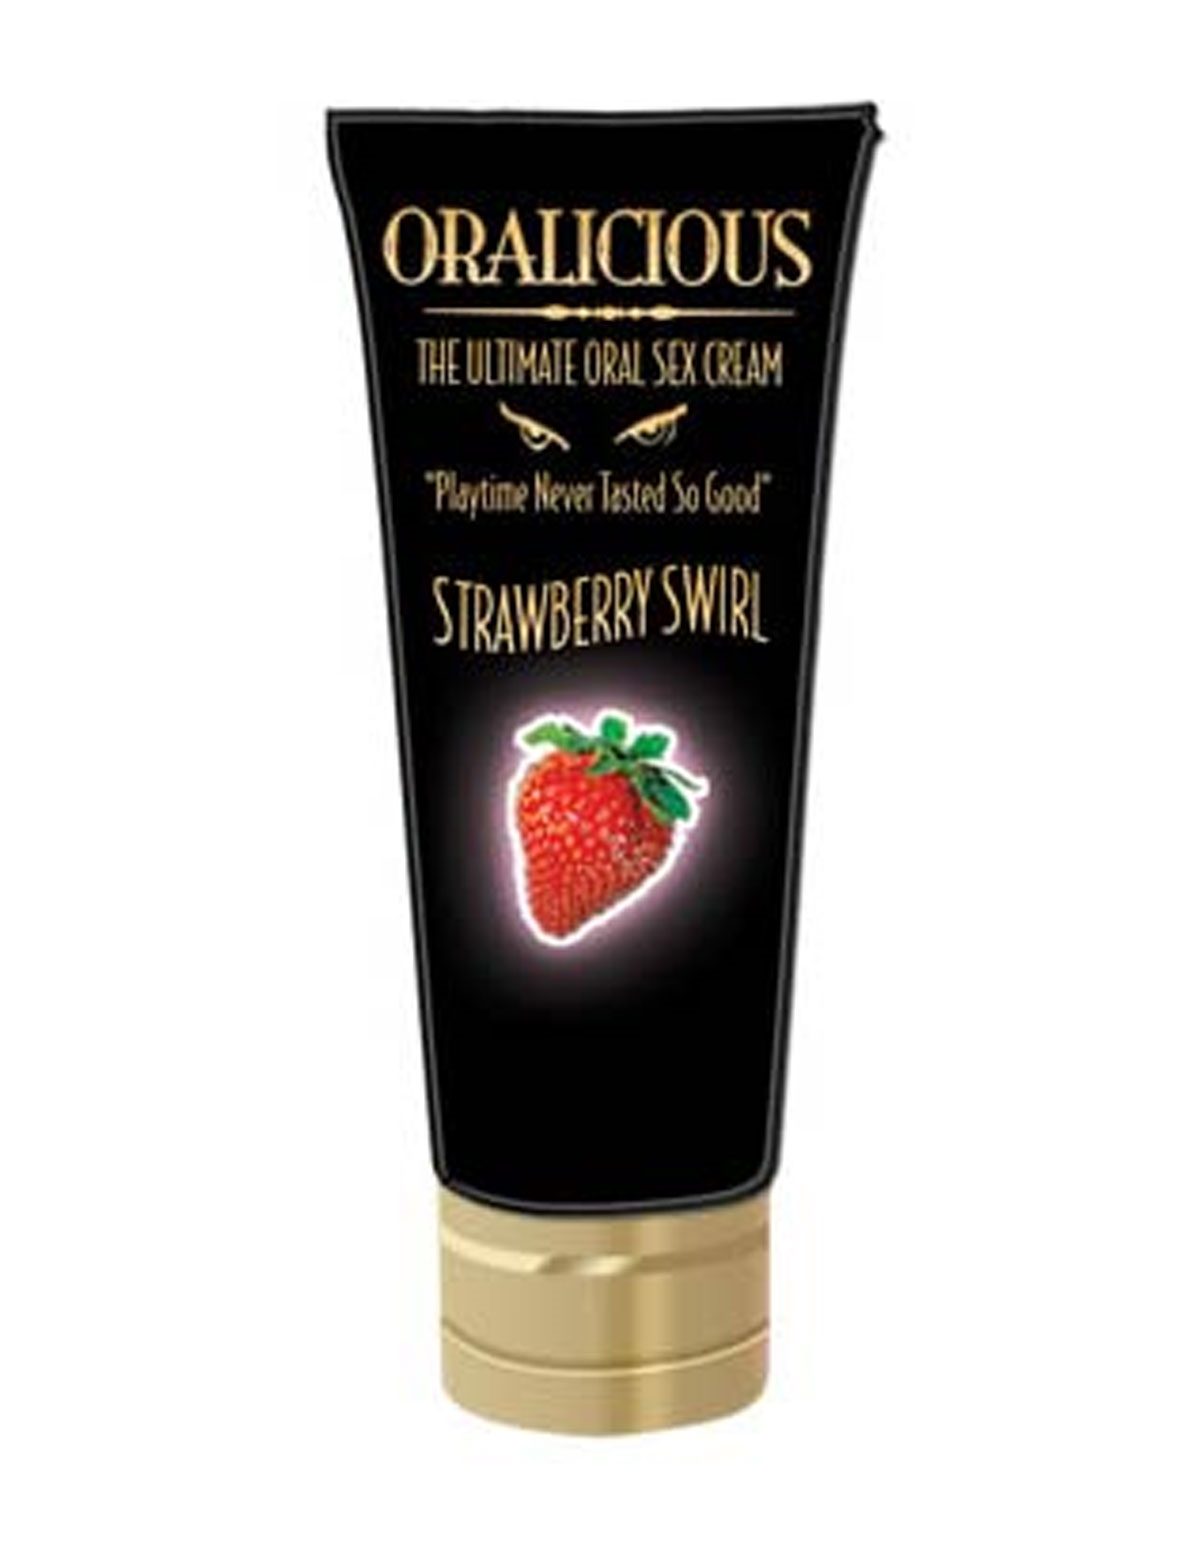 Oralicious Sex Cream Strawberry